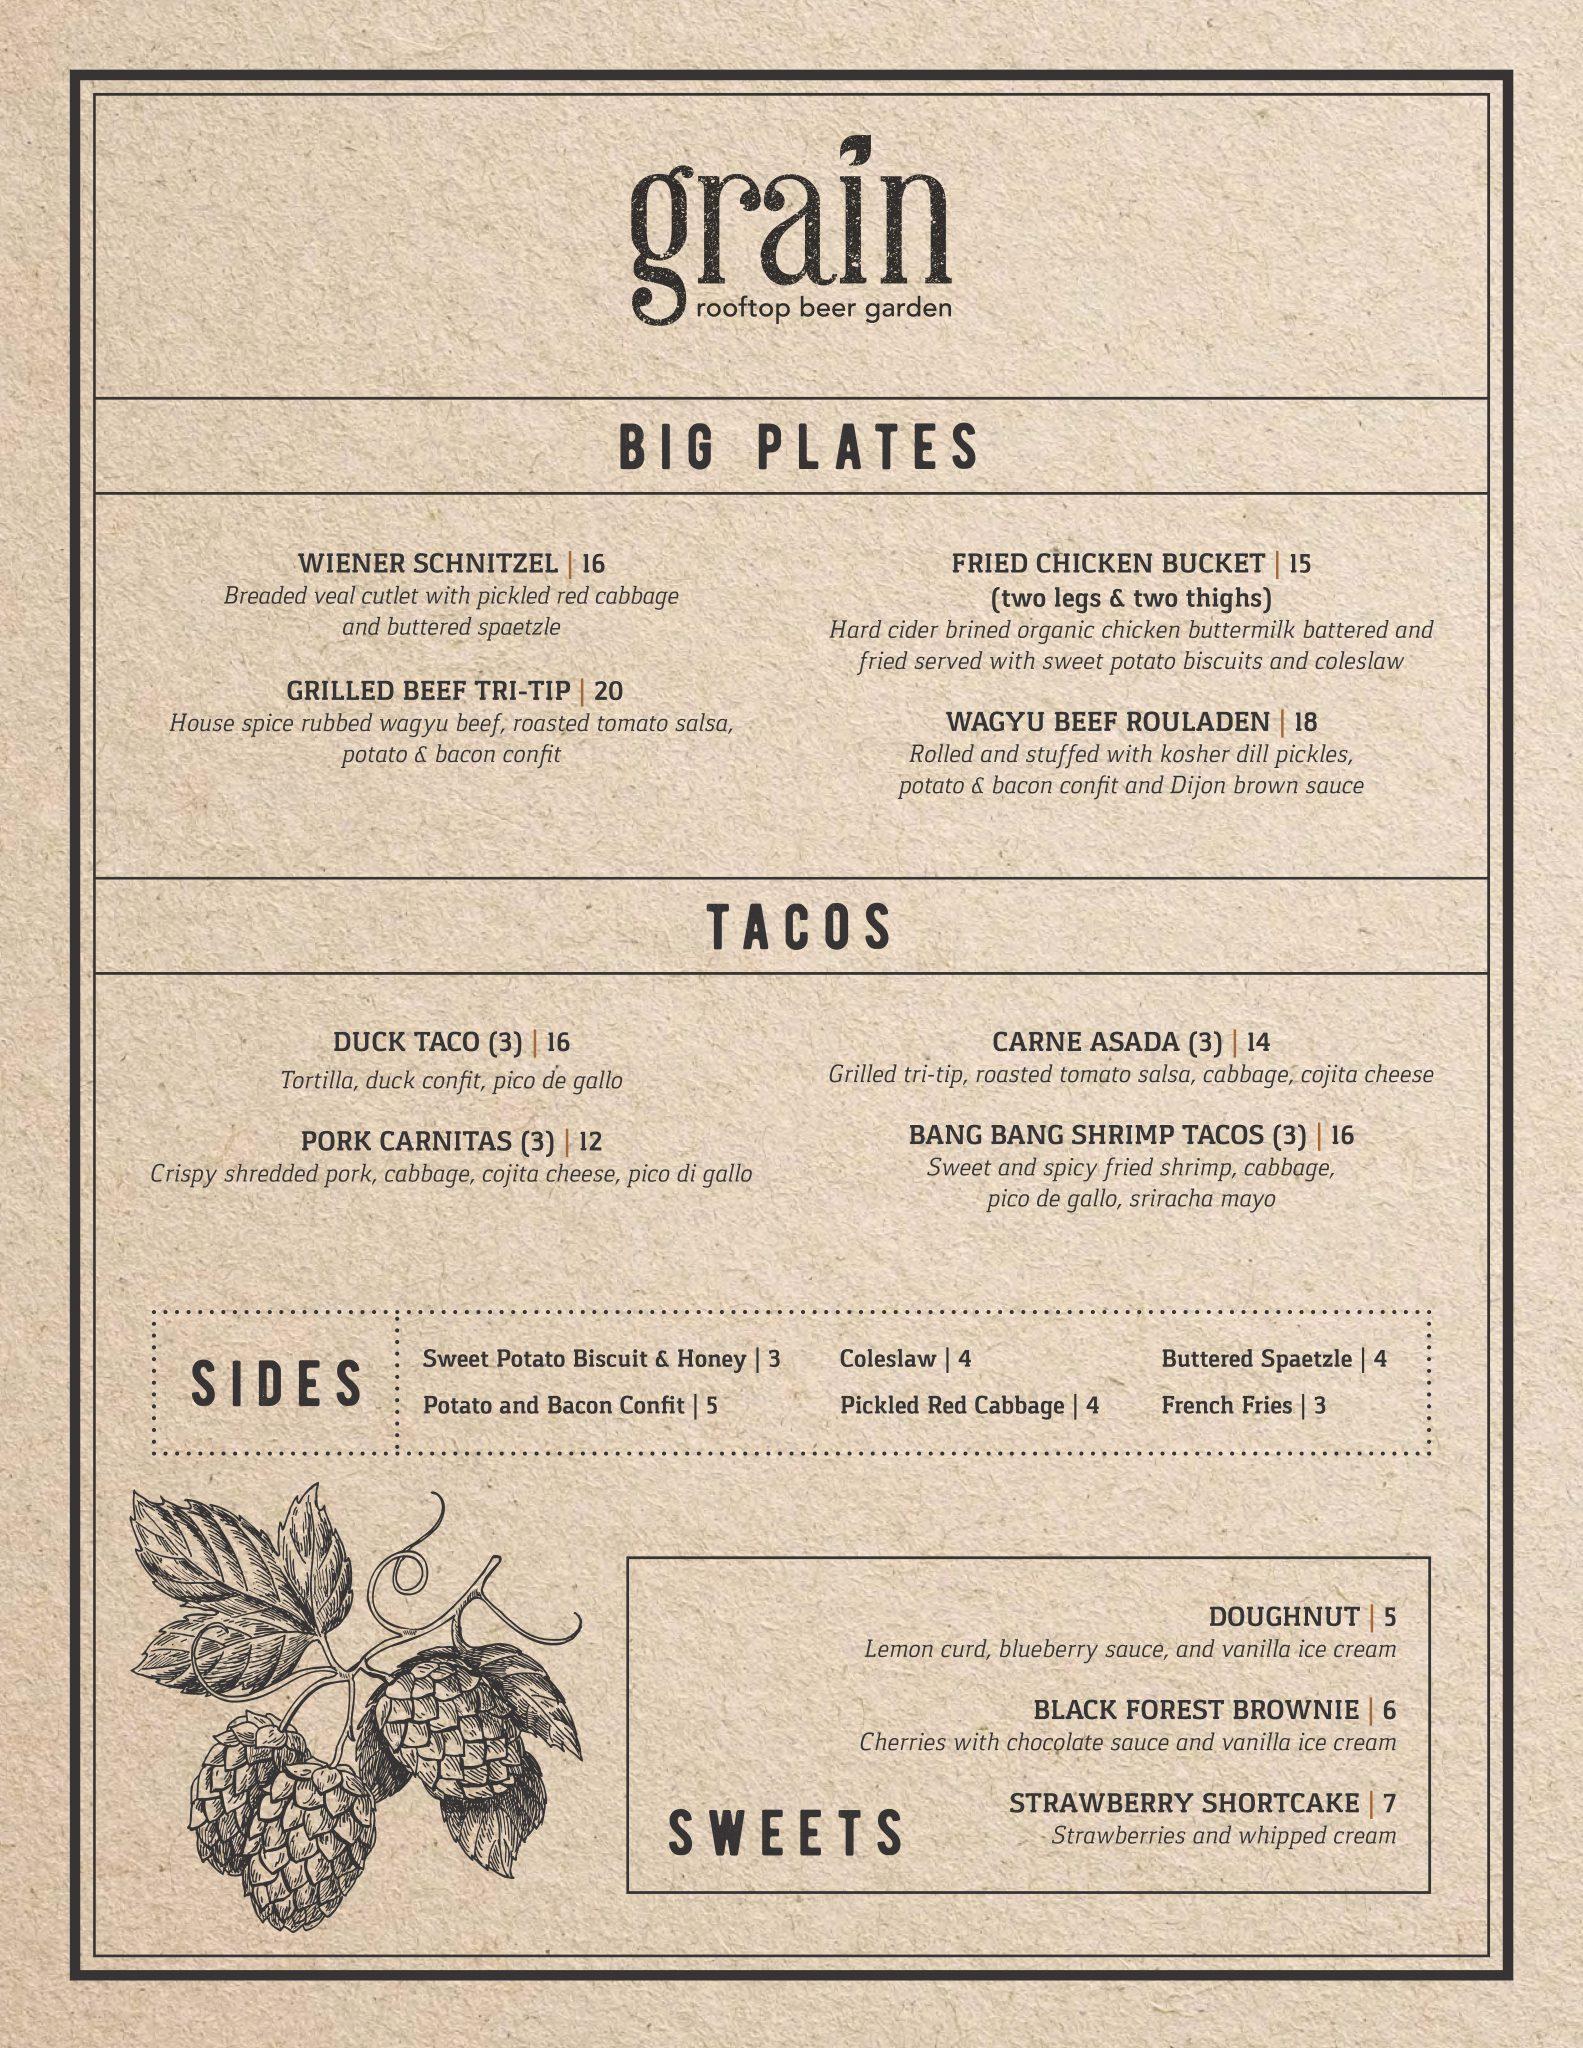 GRAIN_4184 Dinner Menu_5-2-18_web_Page_2